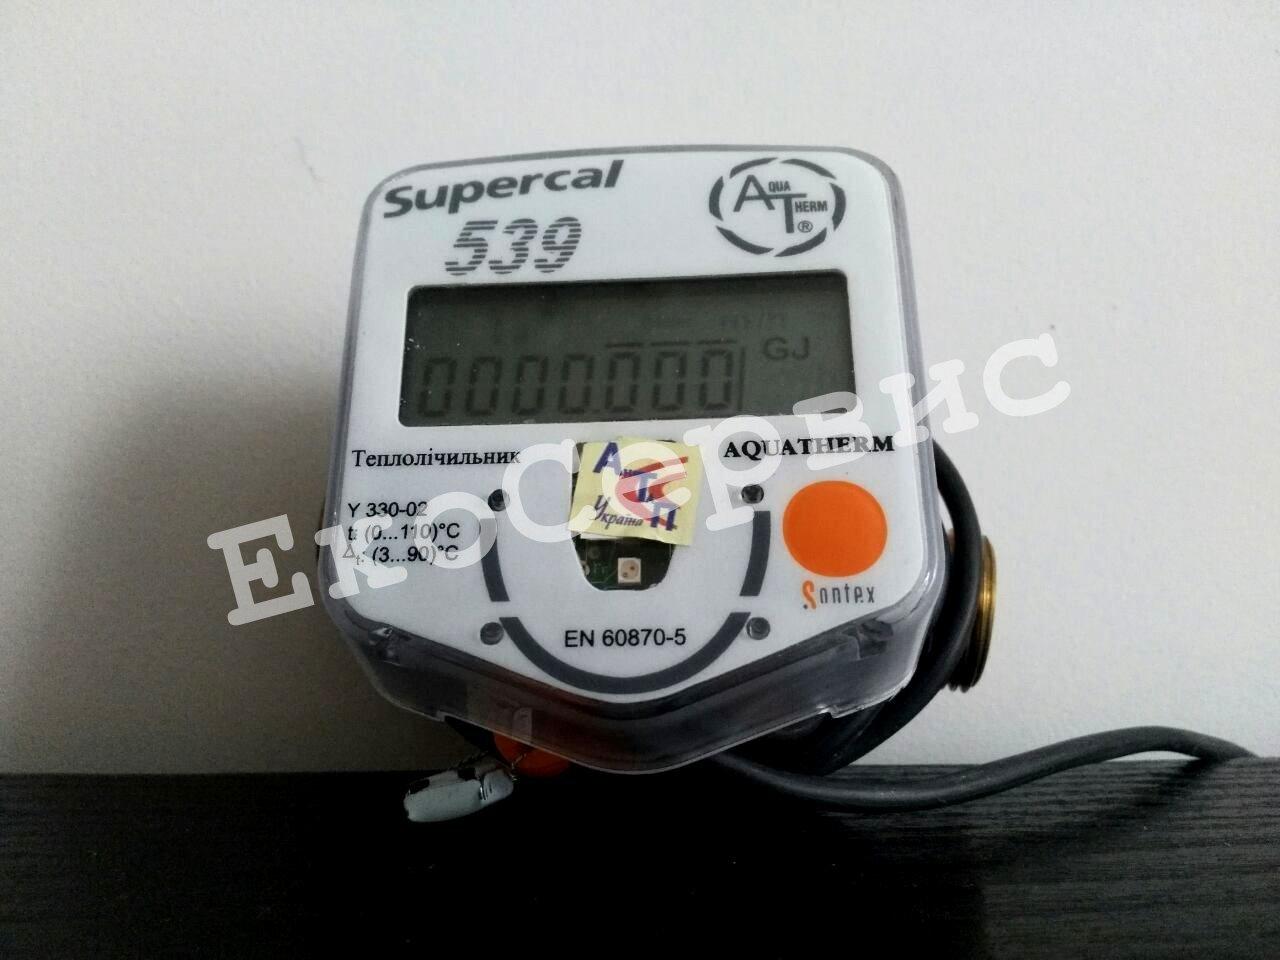 Supercal 539